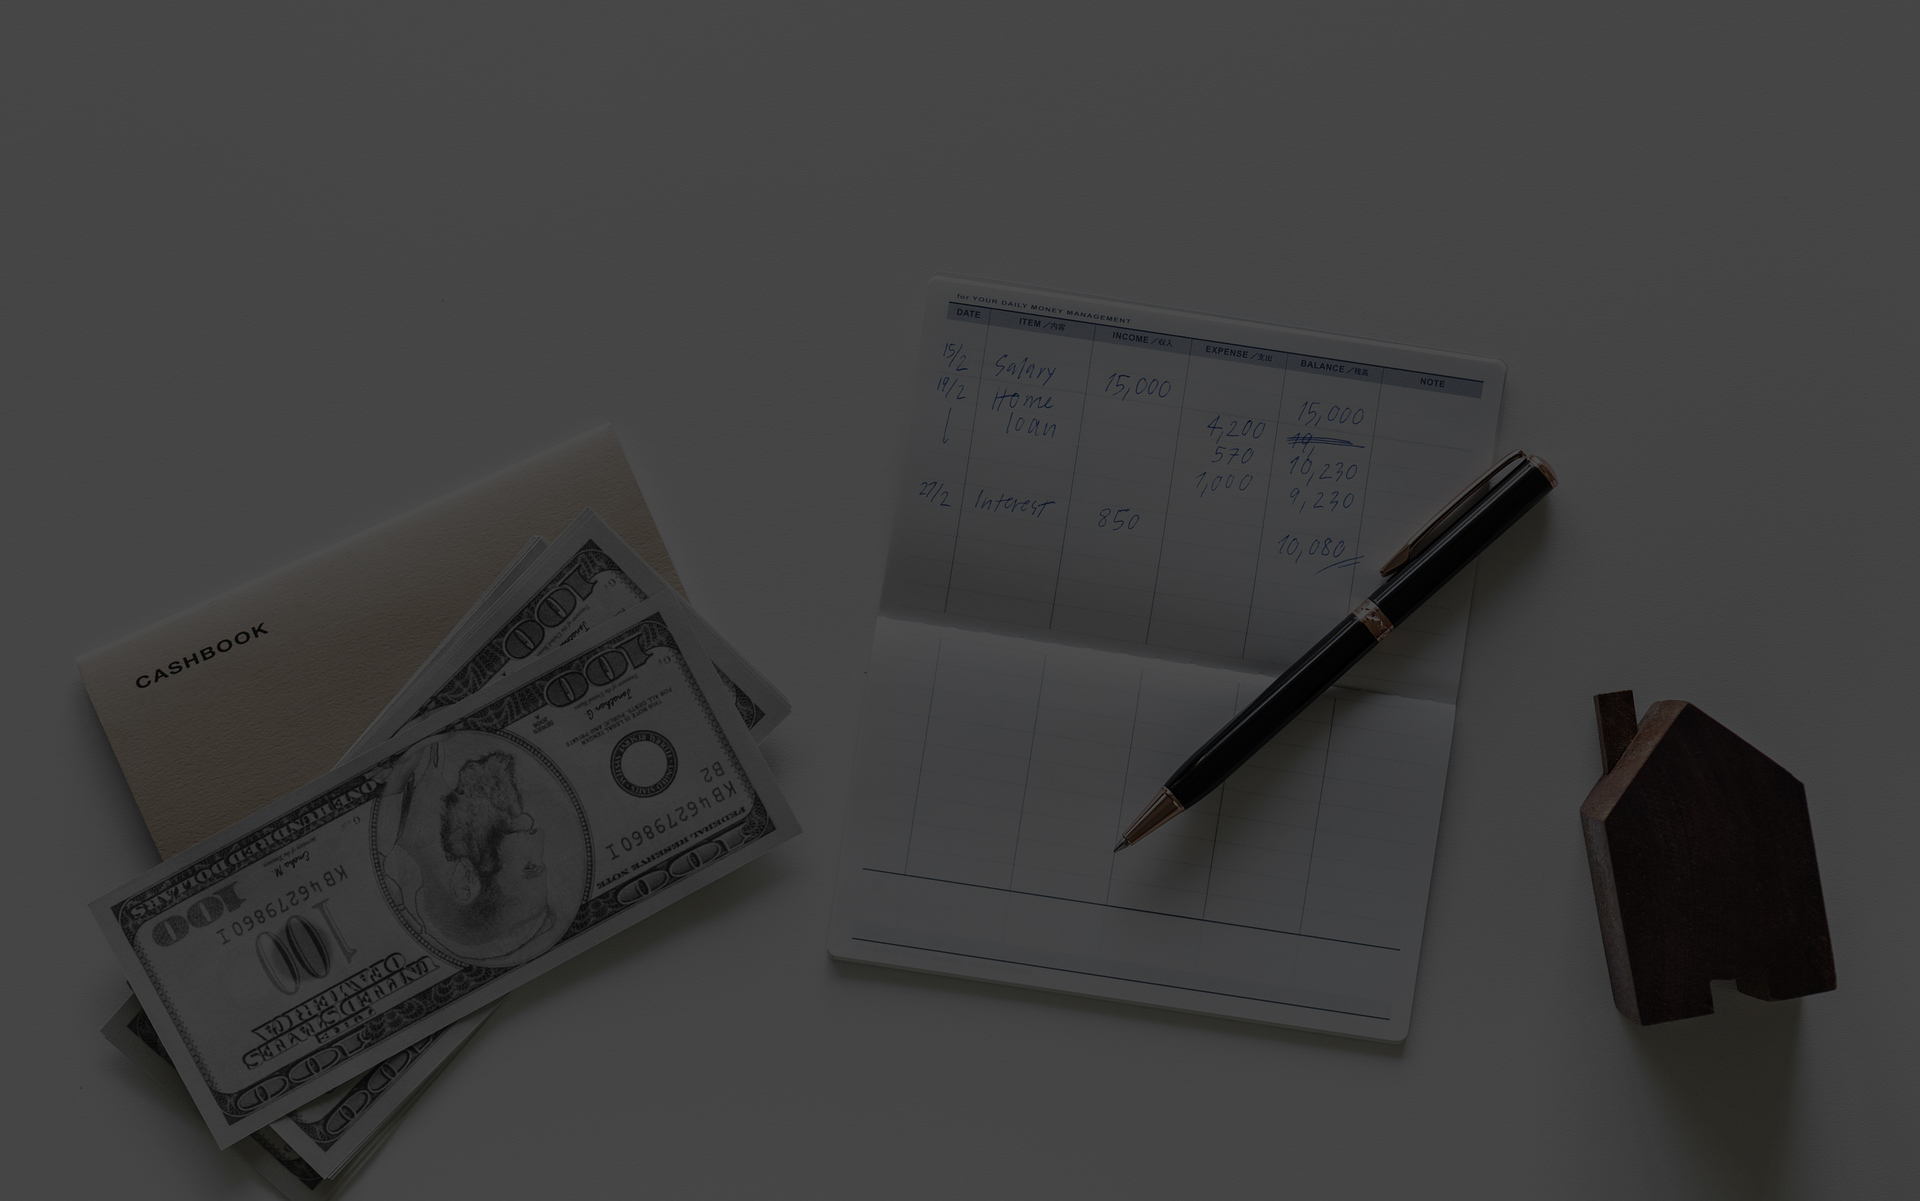 Biweekly Mortgage Payments: Yay or Nay?